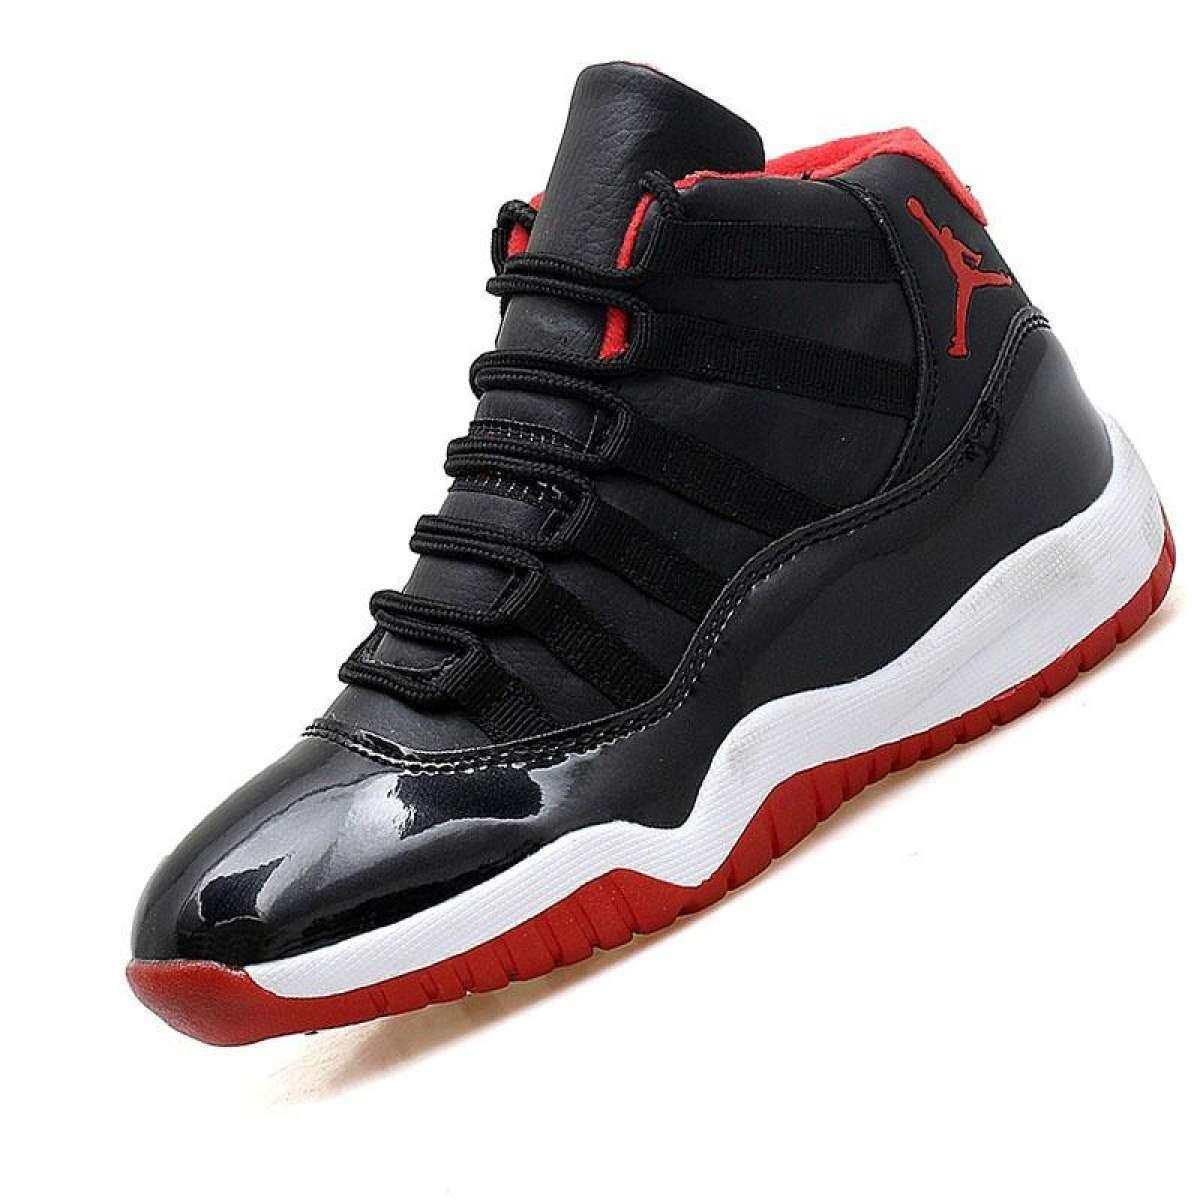 quality design 3909f abd81 Boys  Basketball Shoes - Buy Boys  Basketball Shoes at Best Price in  Malaysia   www.lazada.com.my